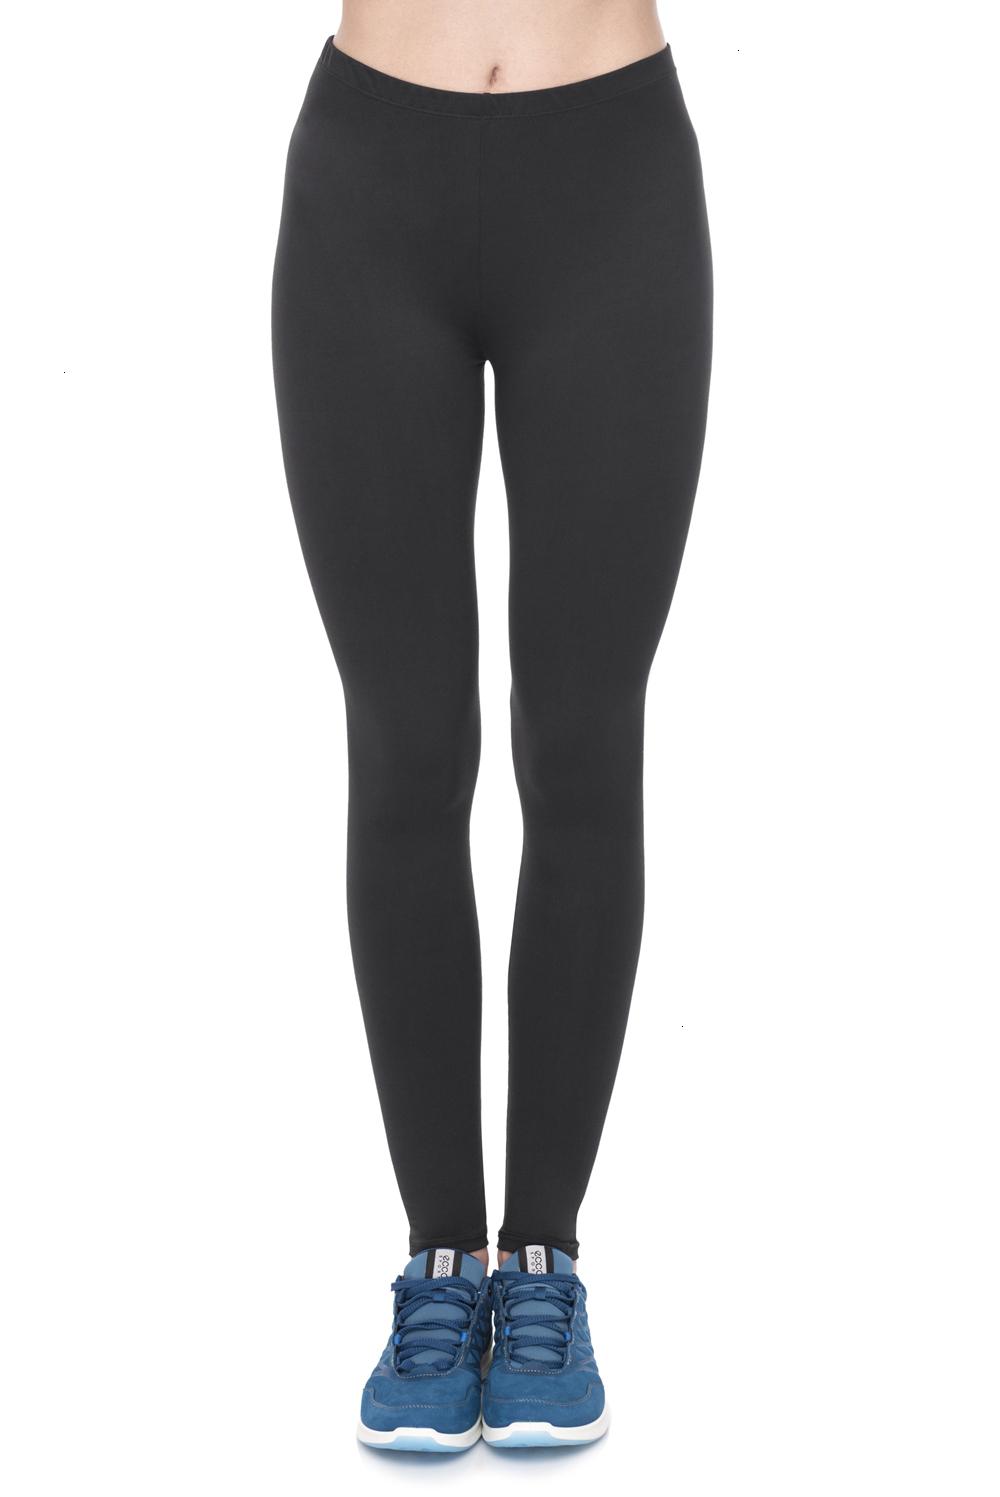 lgb00003 Basic leggings black fashion style (19)